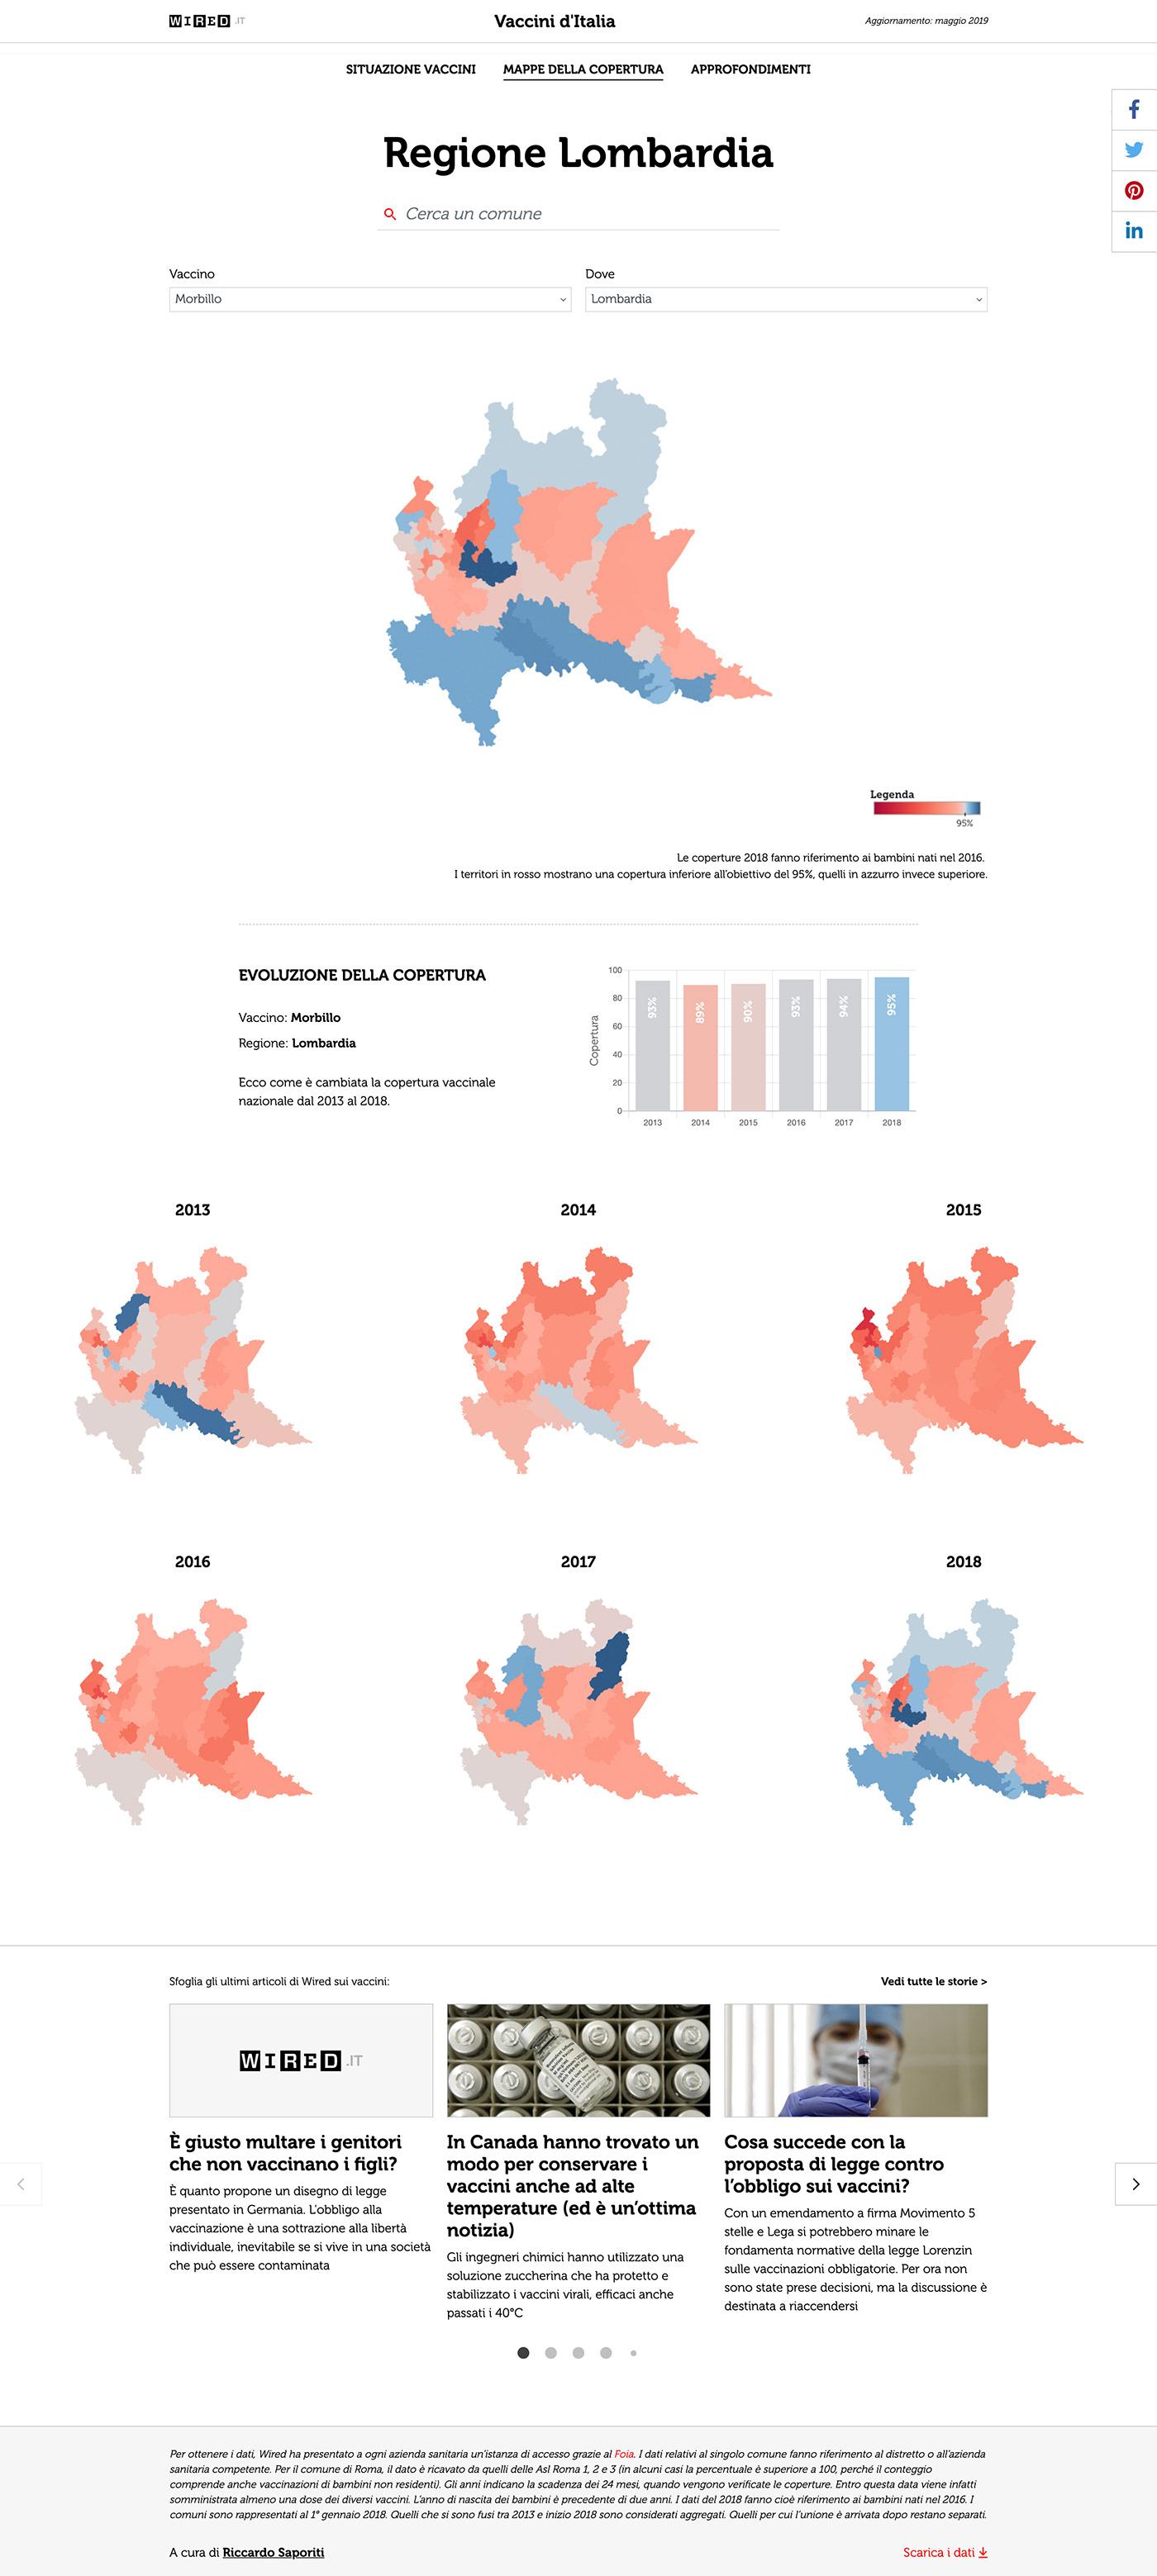 infographic scientific data healt voice VAI Happy path